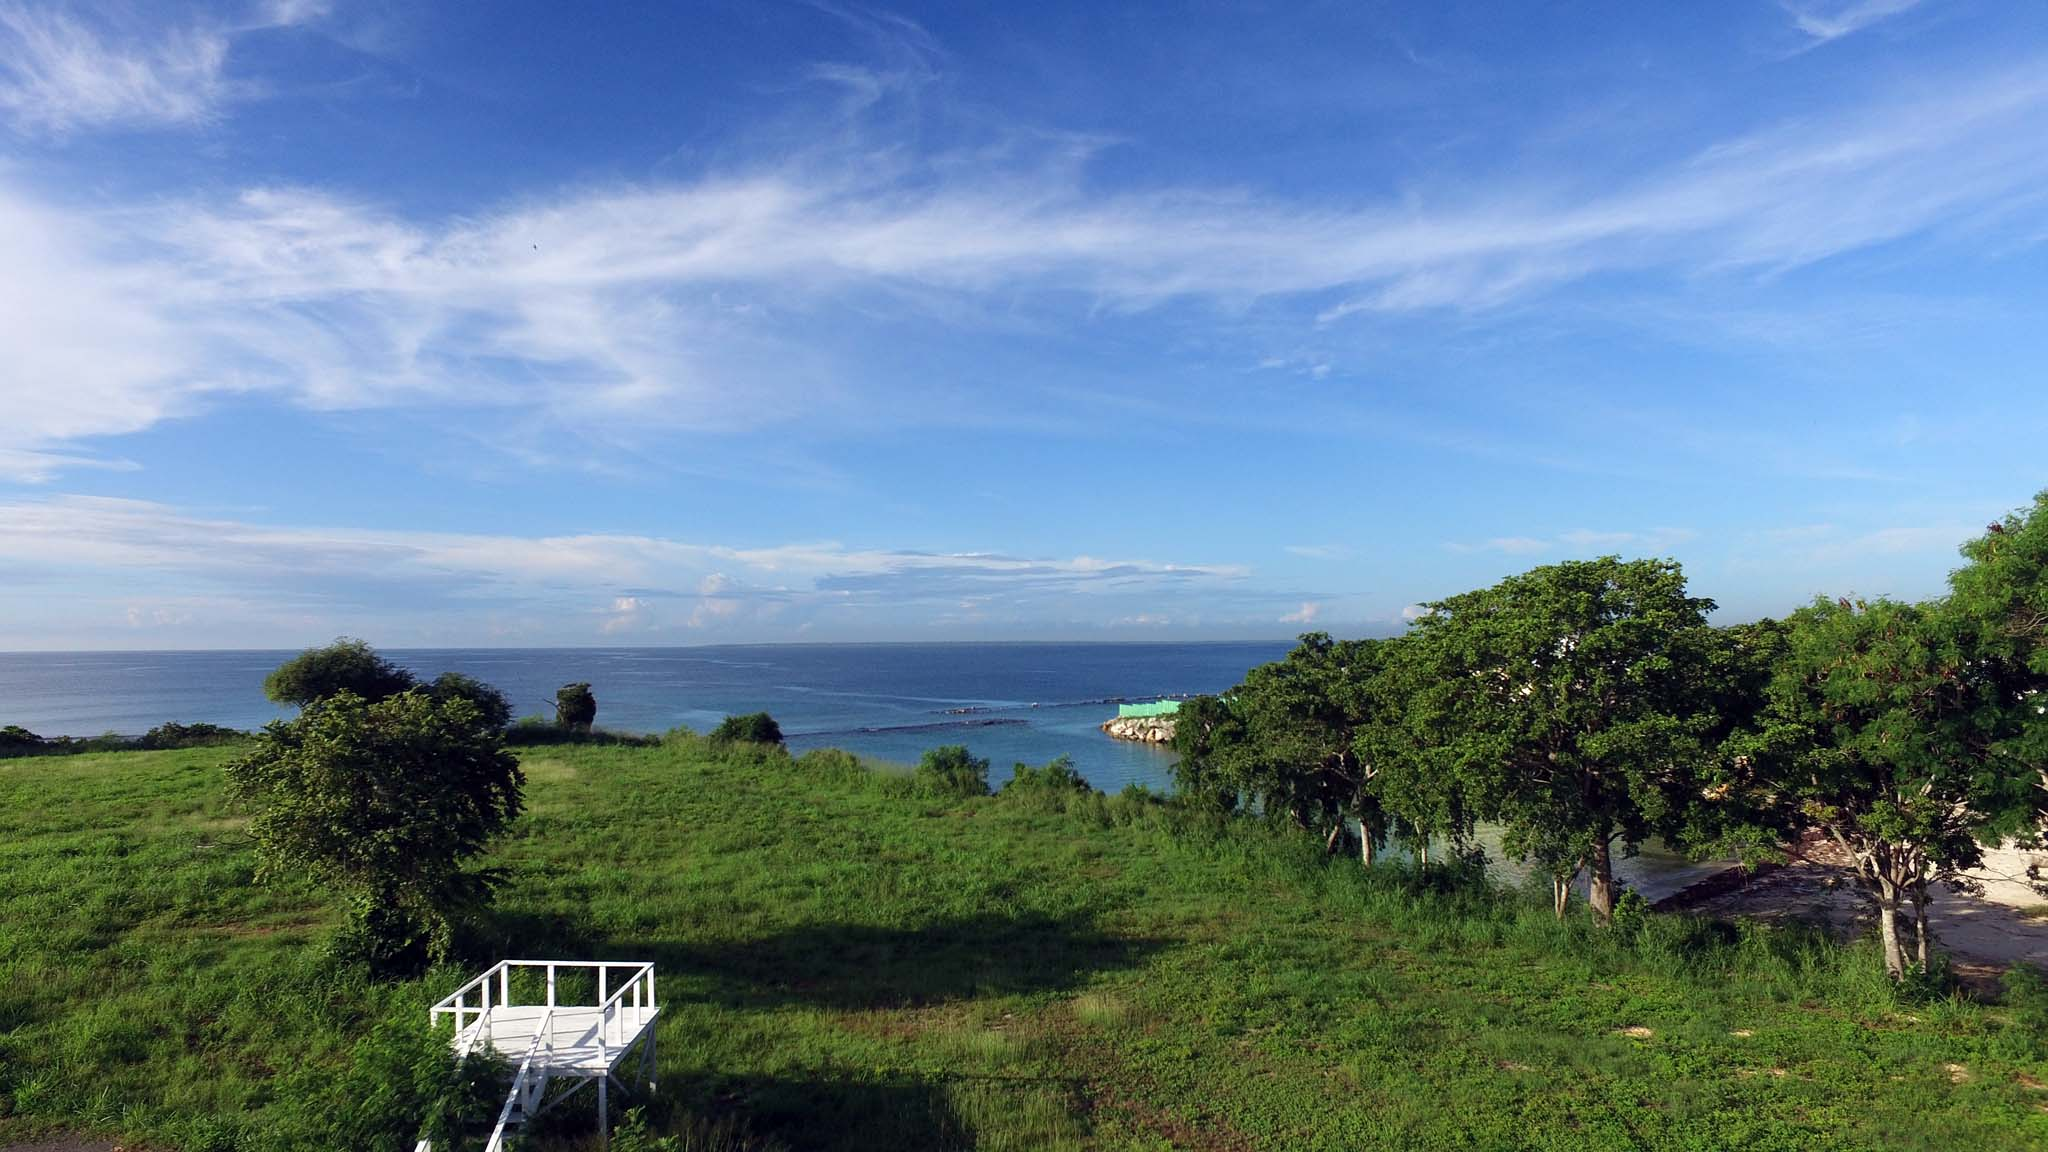 Land for Sale at Exquisite Oceanfront home site next to White-Sand Beach Casa De Campo, La Romana, Dominican Republic